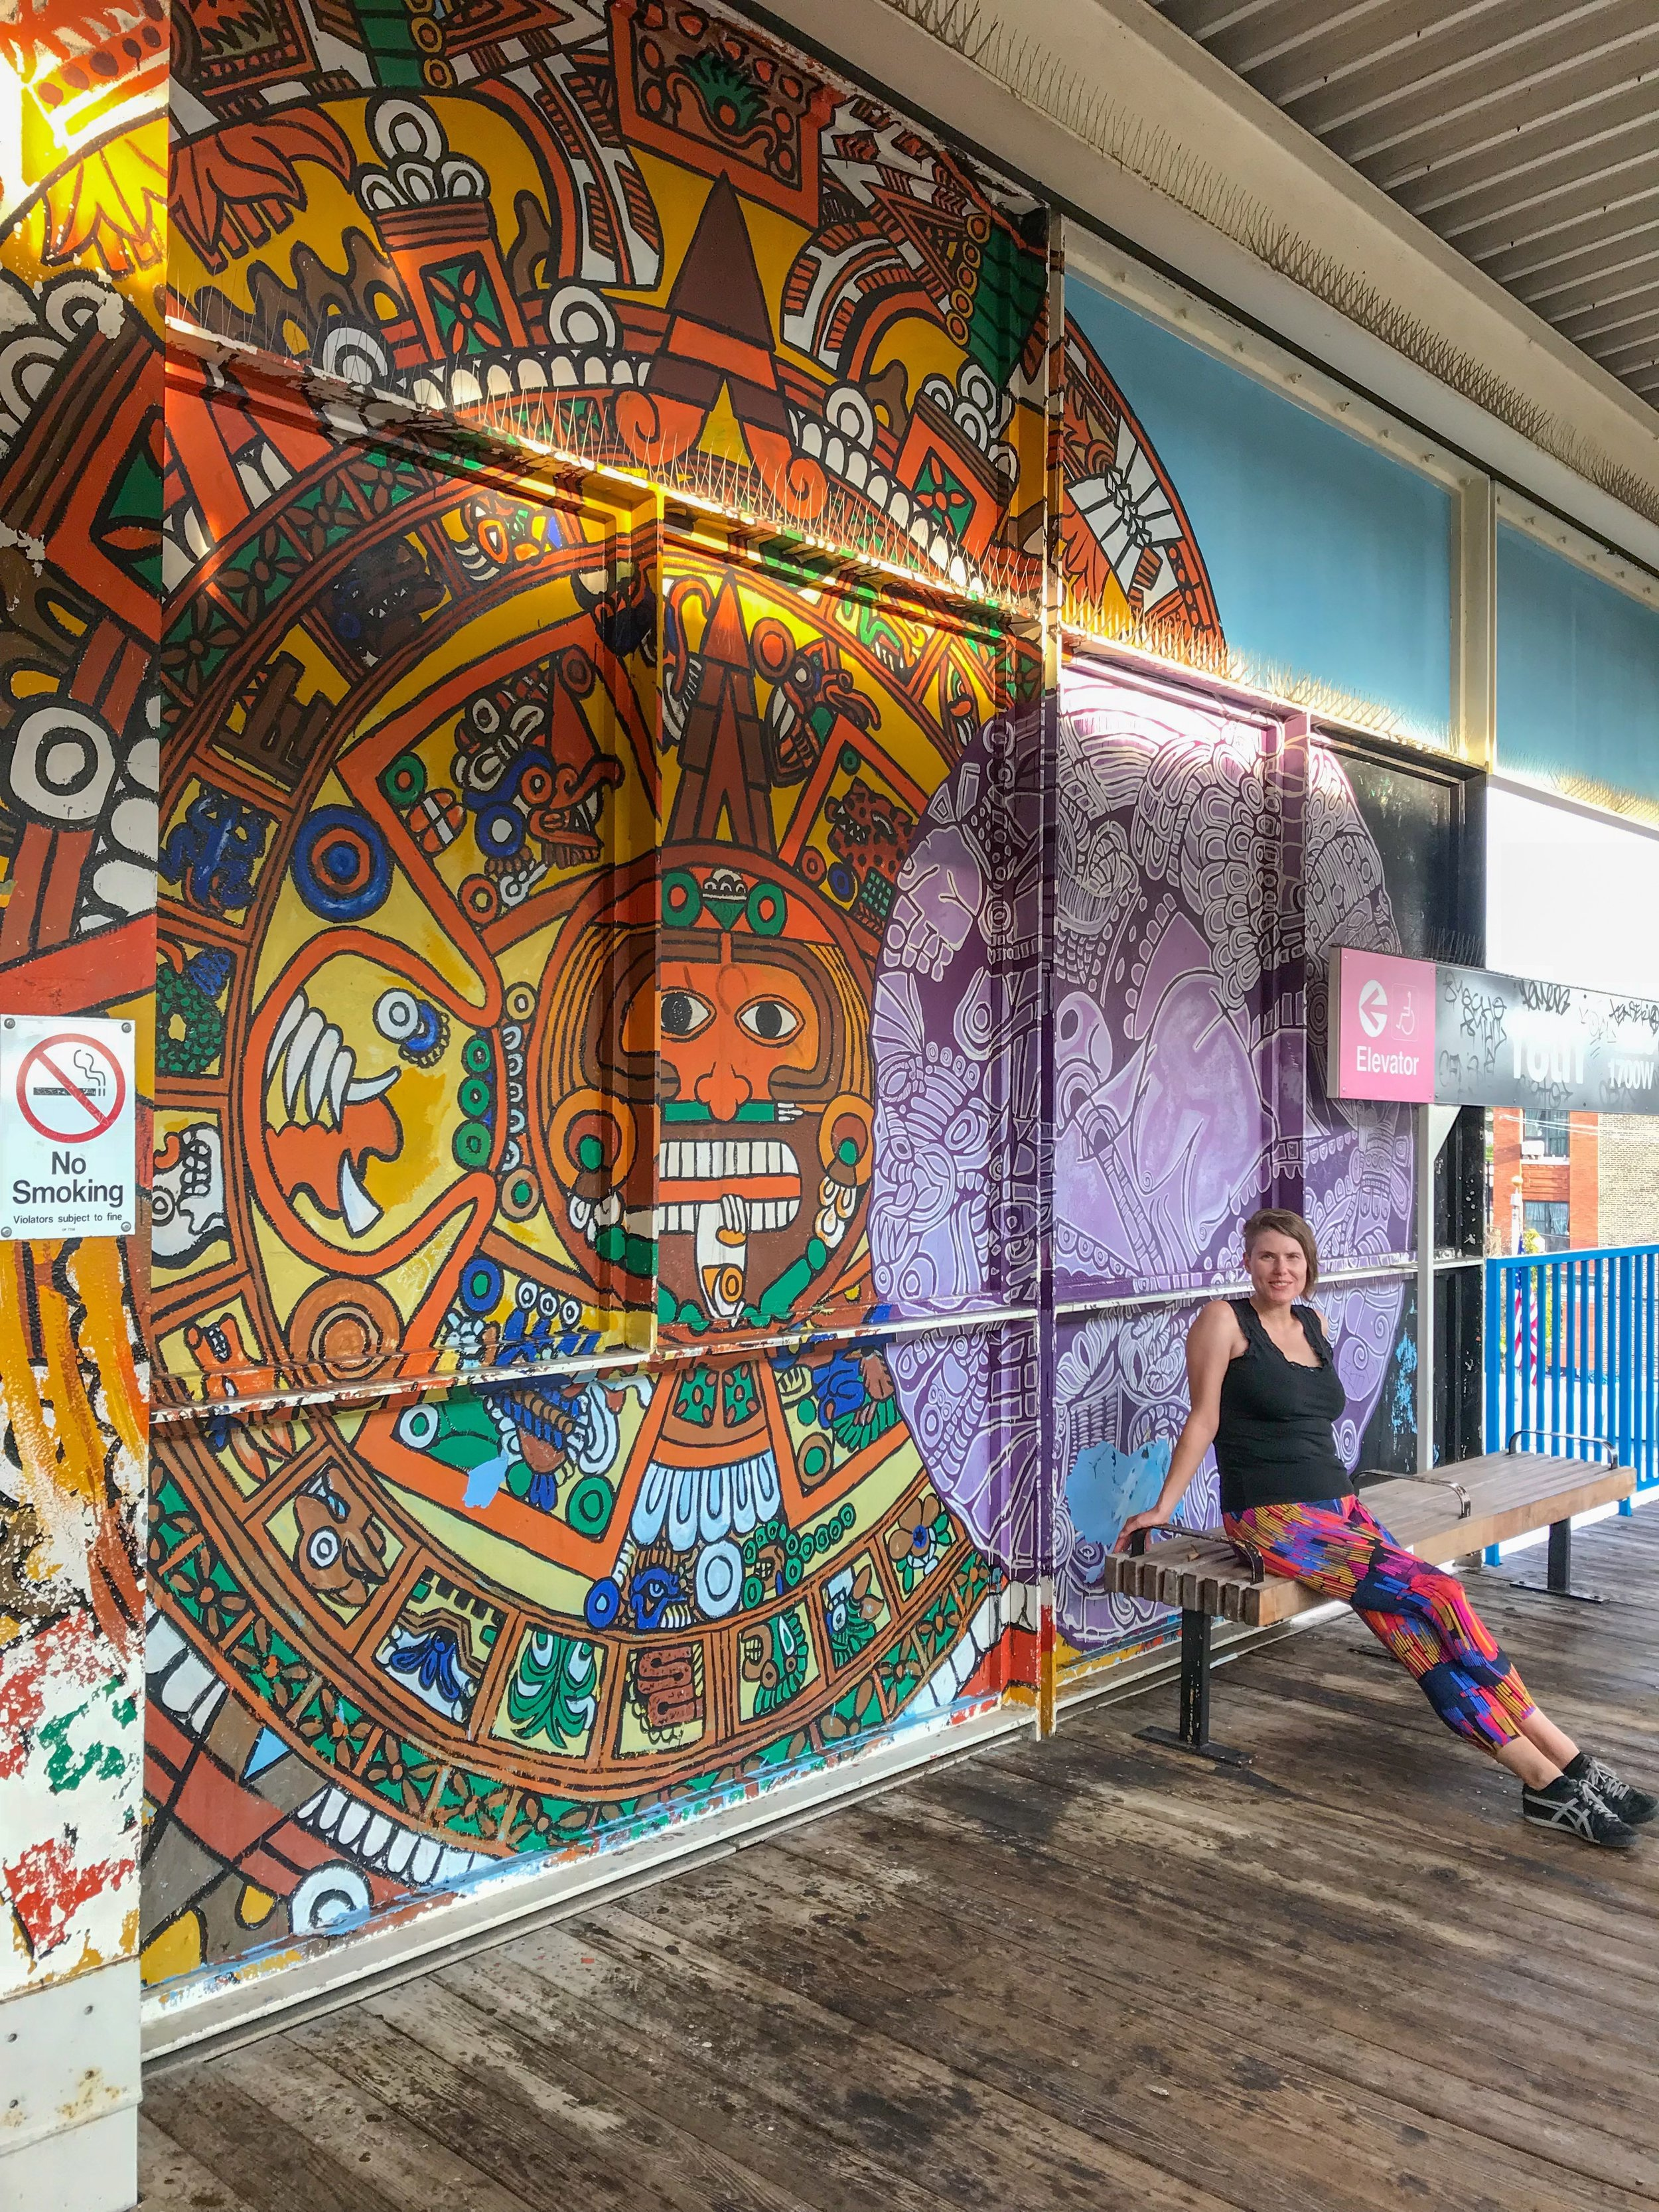 18th Street Metro Station Art